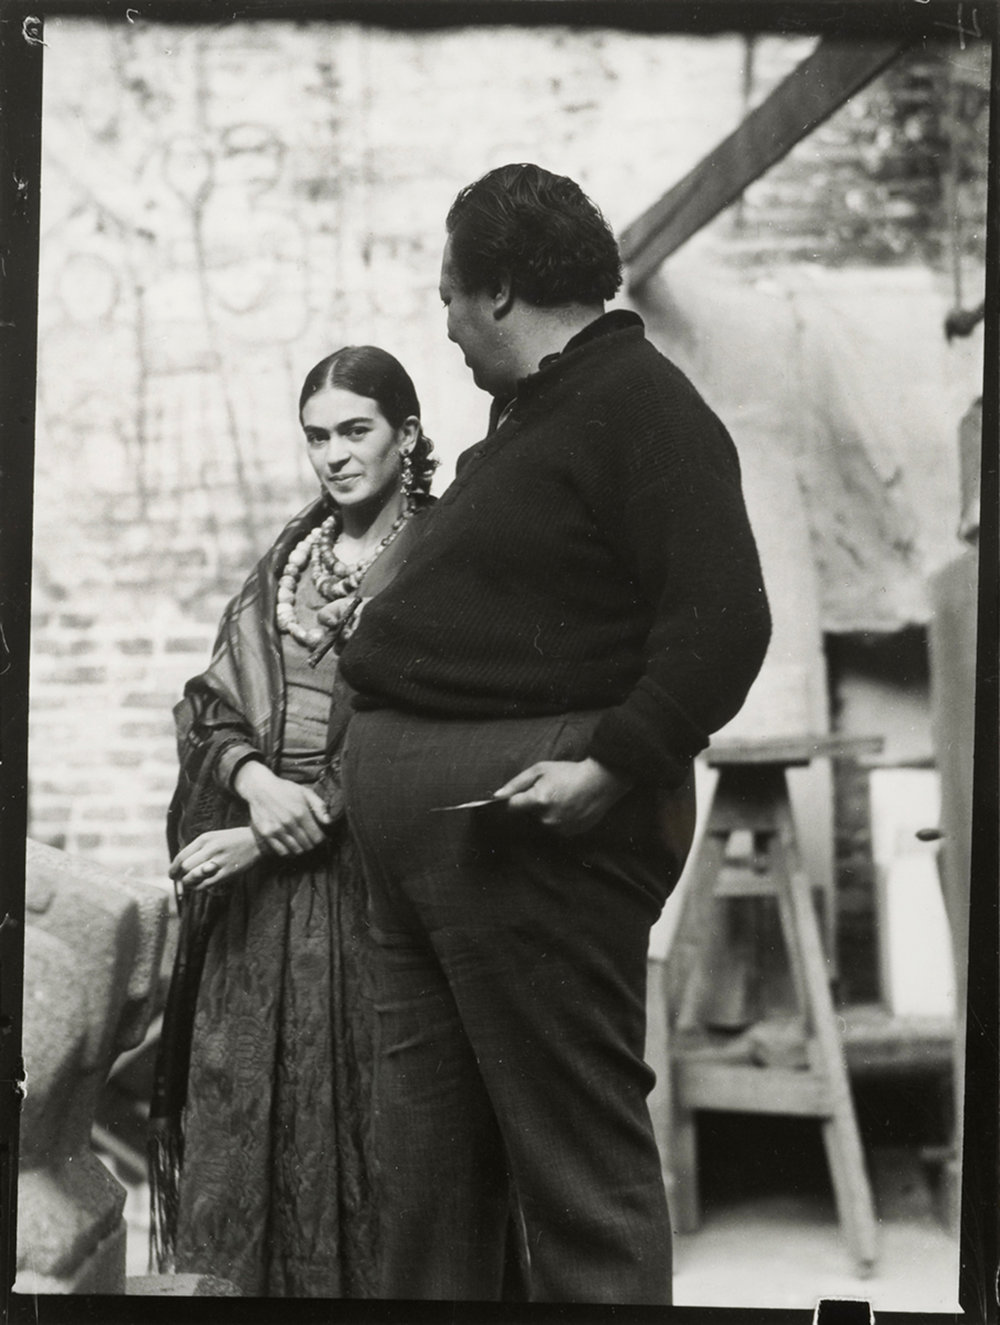 Diego Rivera & Frida Kahlo in San Francisco, c. 1930